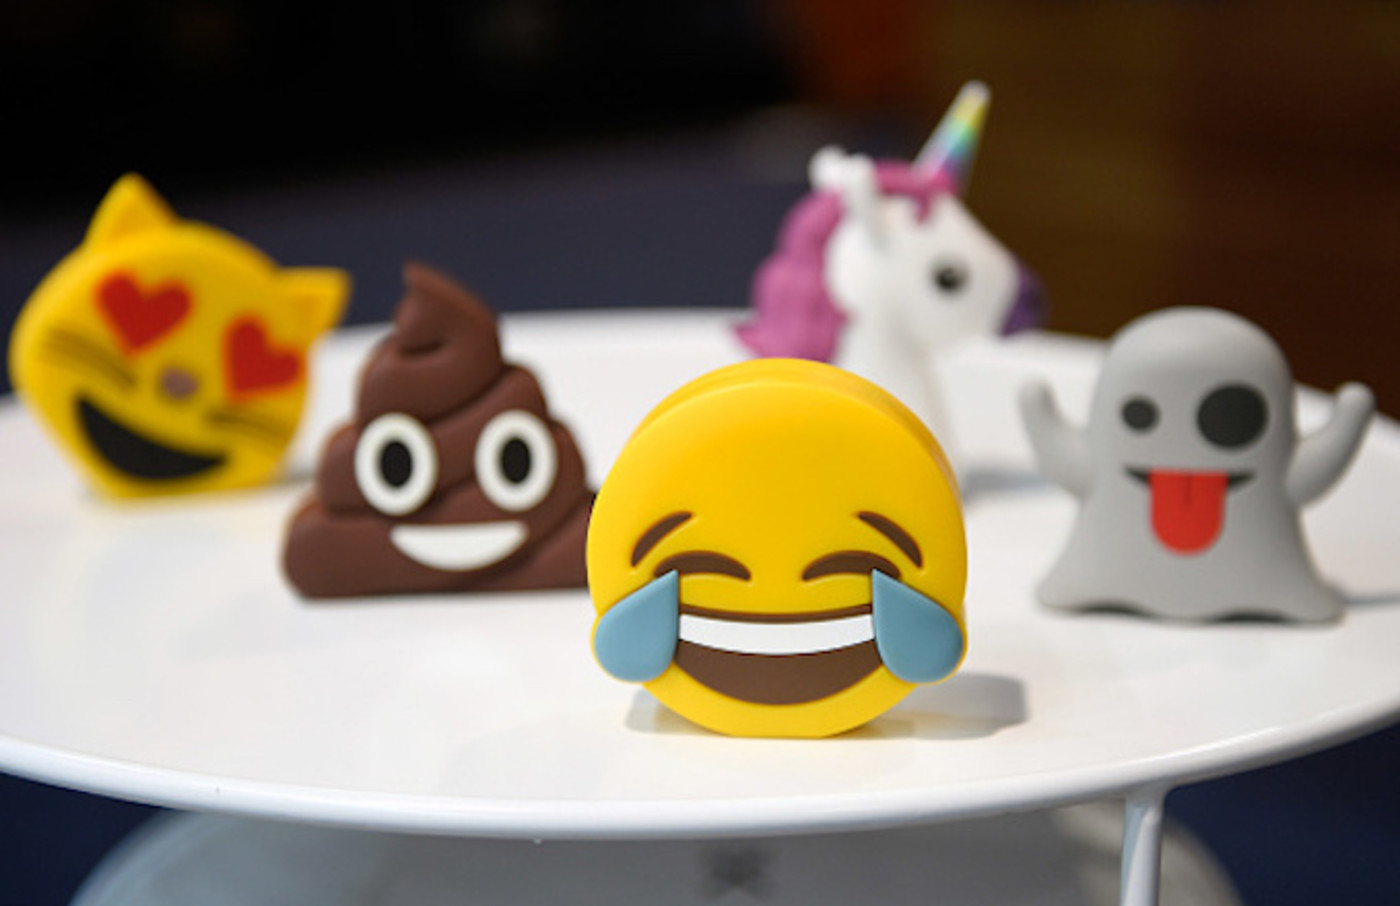 Batteries designed as emojis